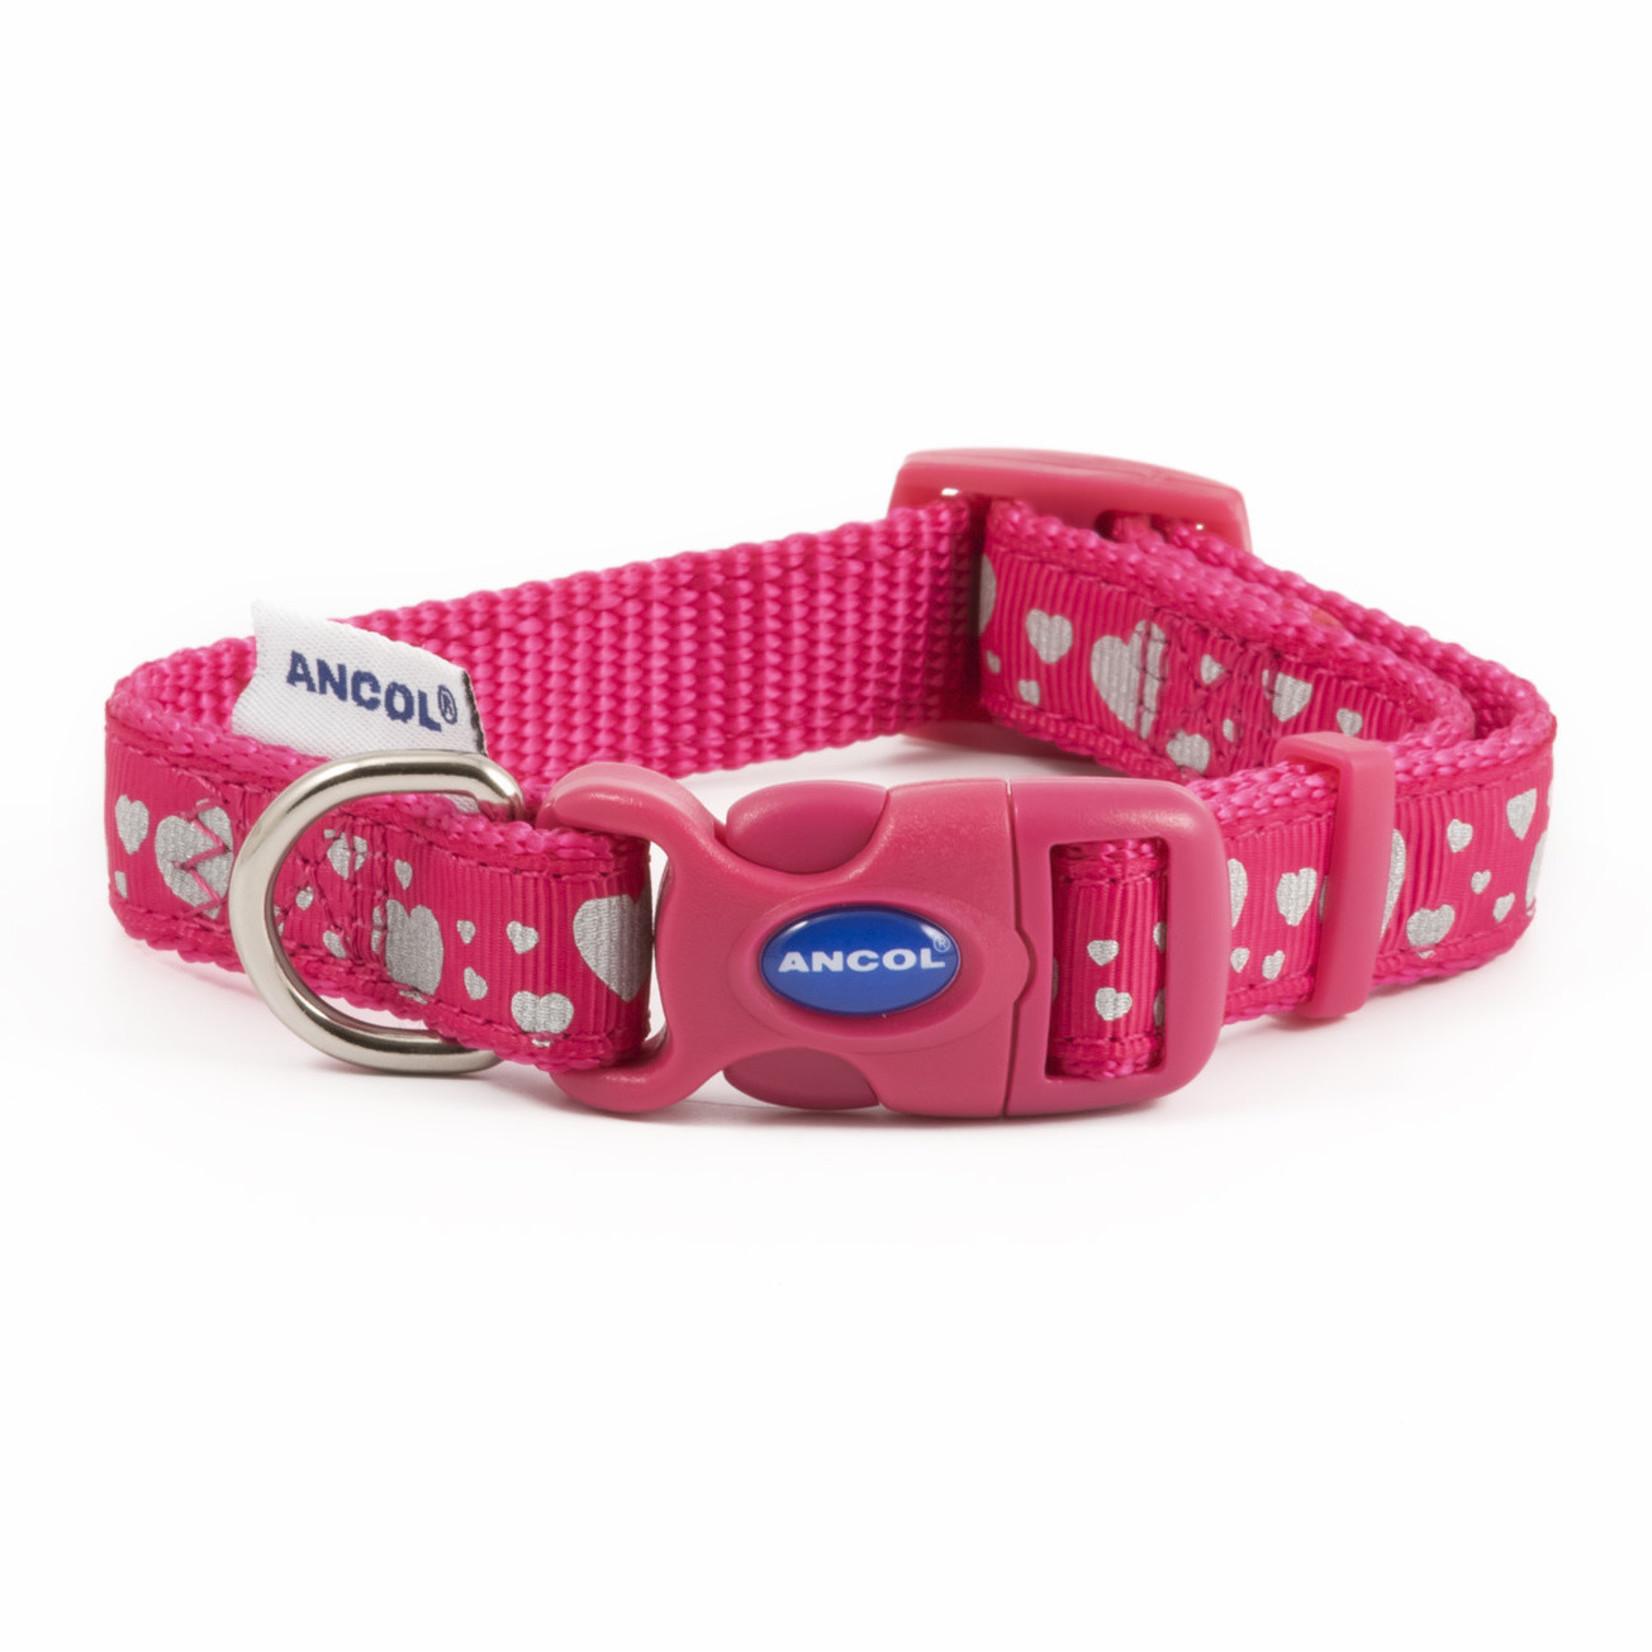 Ancol Adjustable Nylon Pink Reflective Hearts Dog Collar